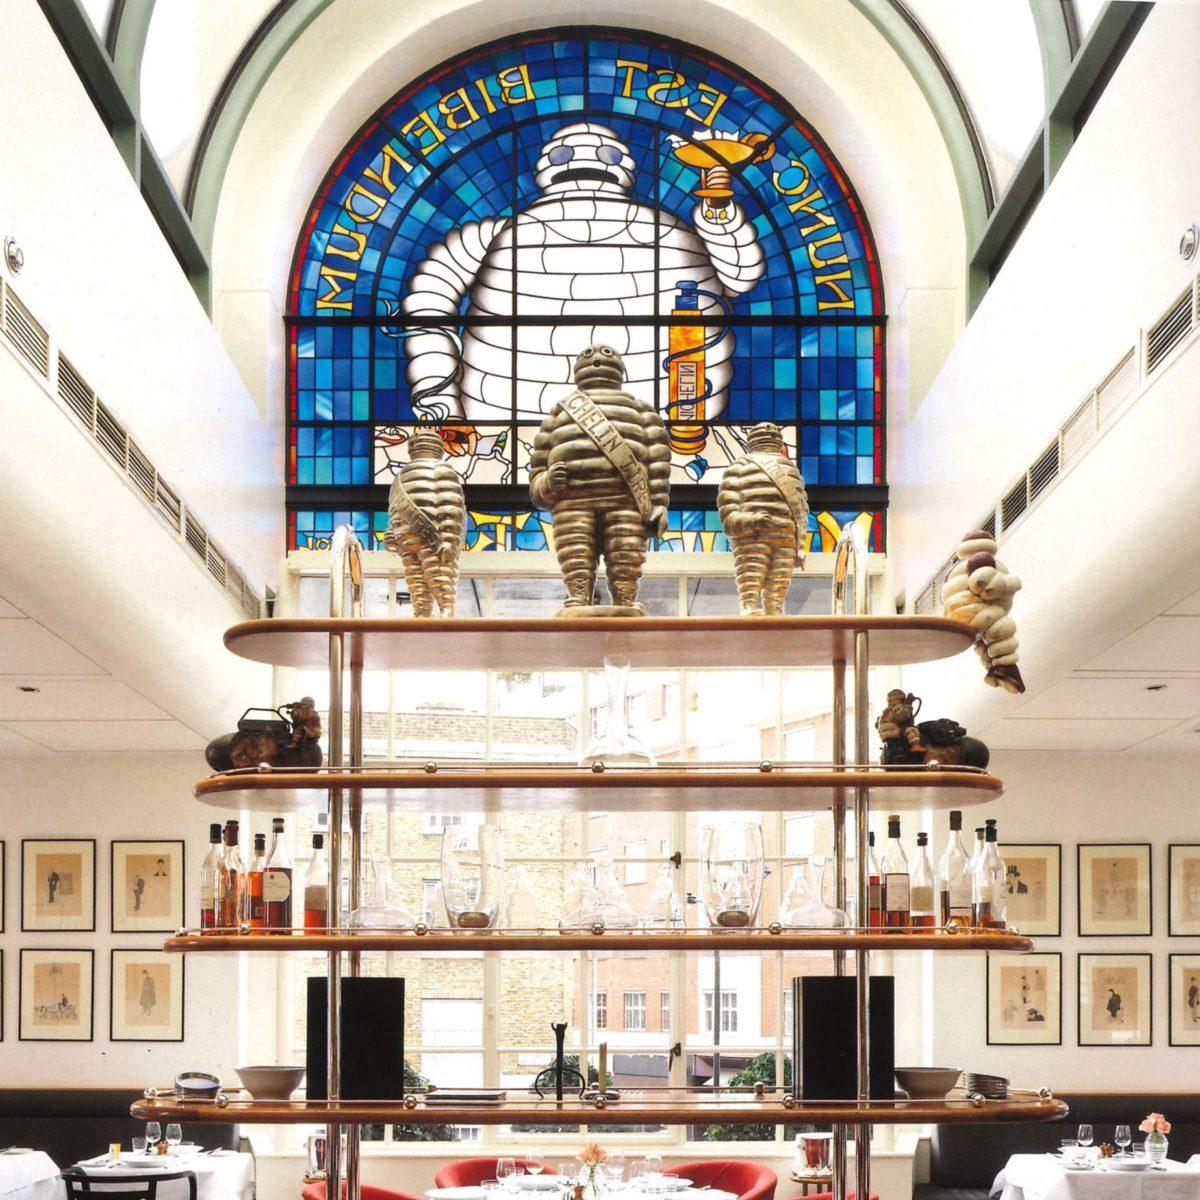 The Bibendum Restaurant. Source: My Life In Design   About us 1980s